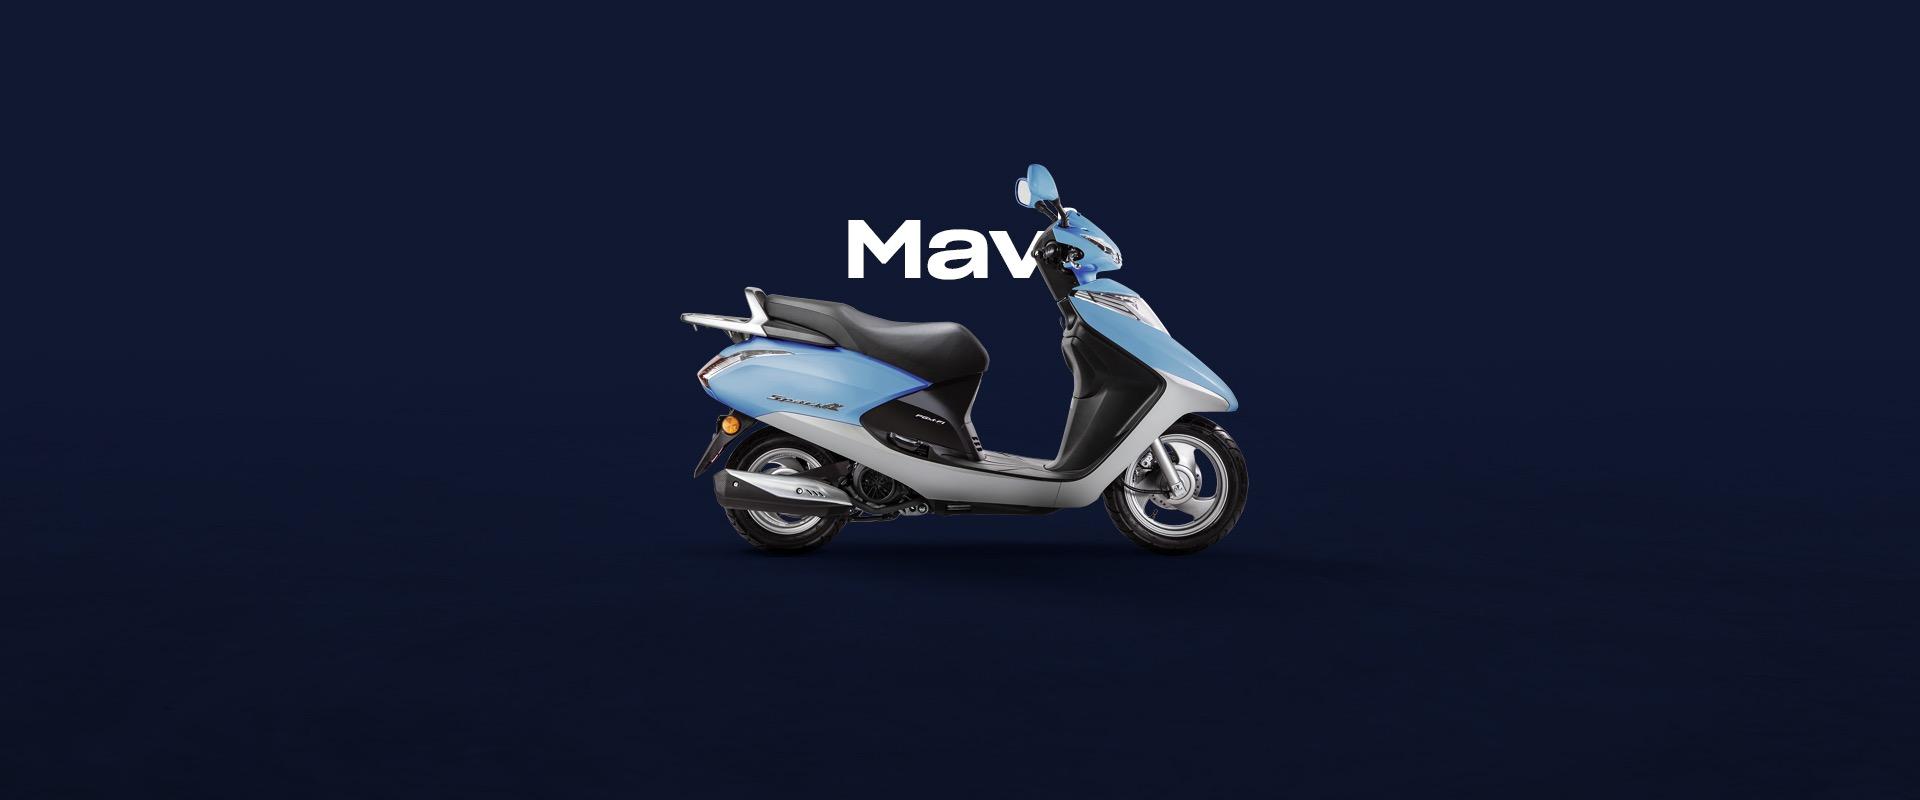 Kıvrak Motor Mavi